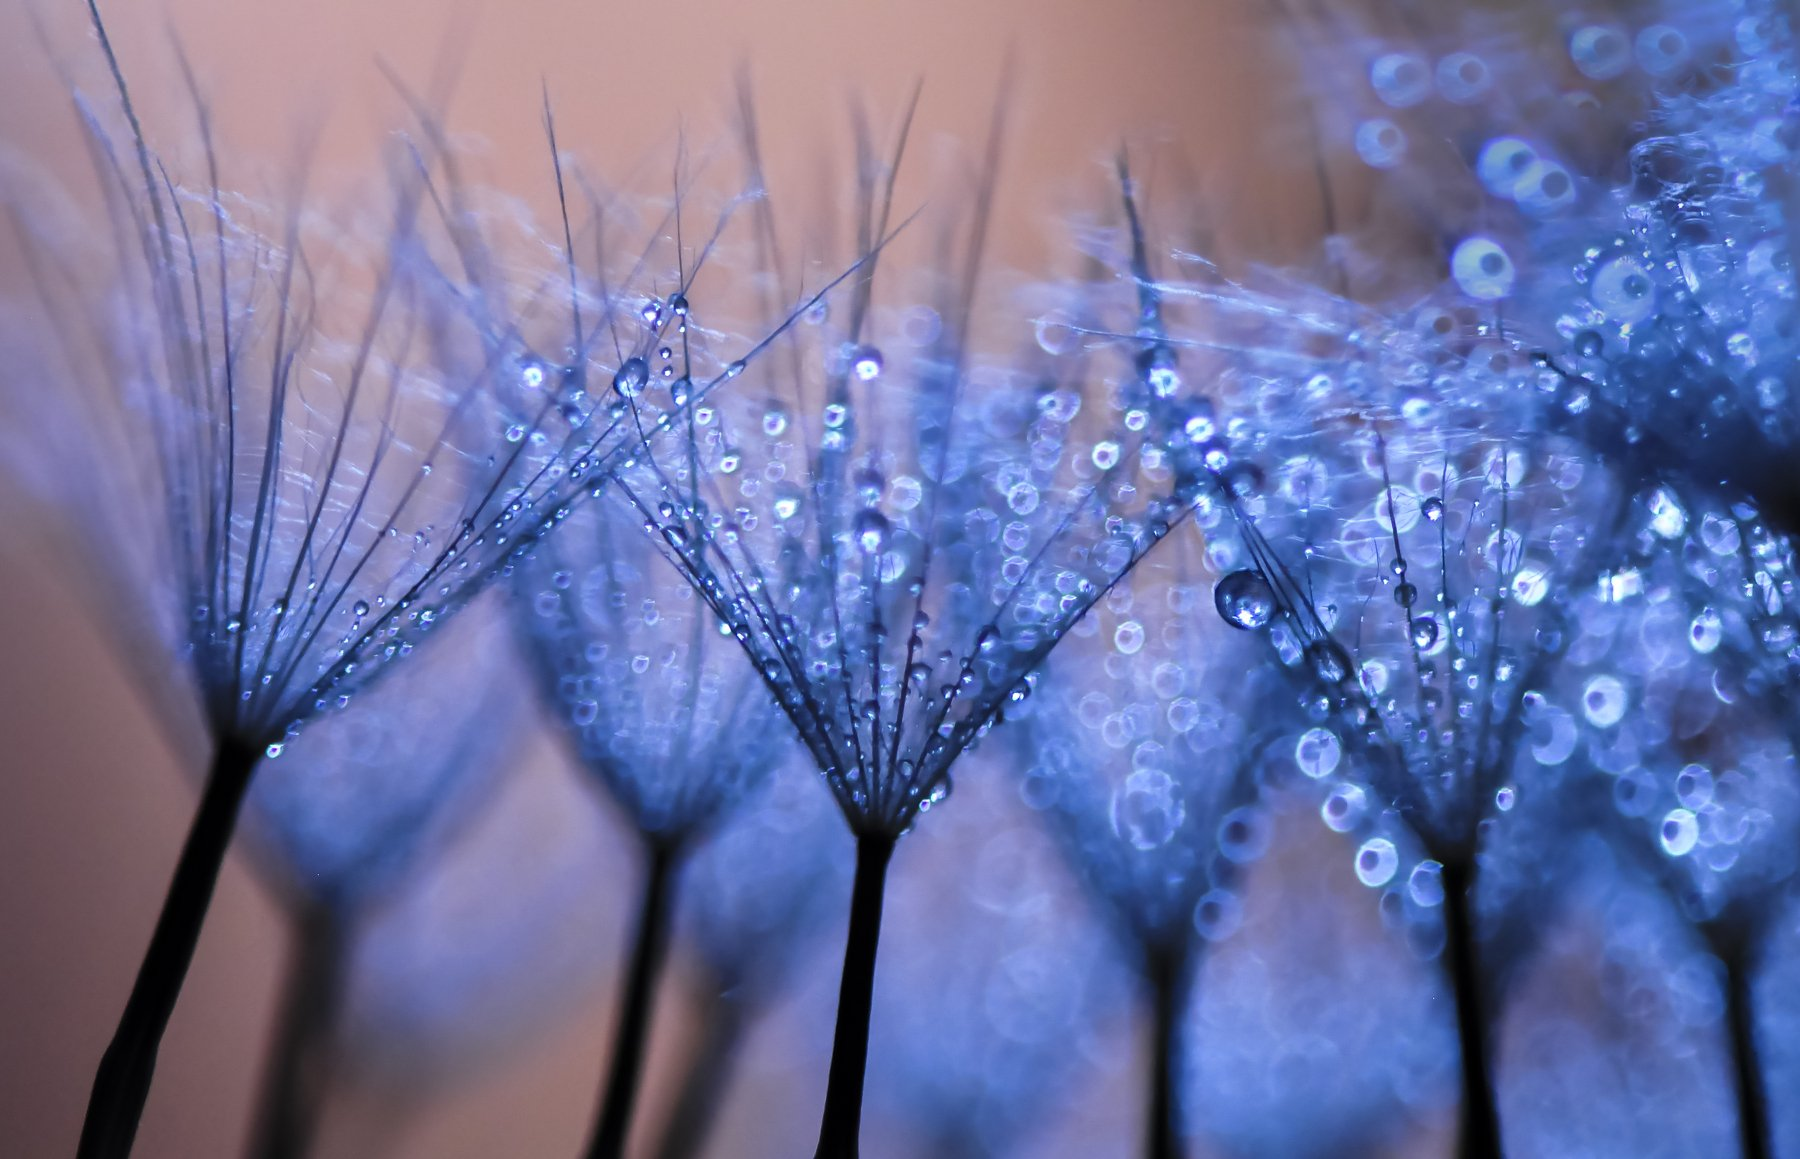 water, macro, light, drops, drop, dandelion, droplet, bokeh,droplets,reflection, вода, макро_свет, капли, Ивелина Благоева